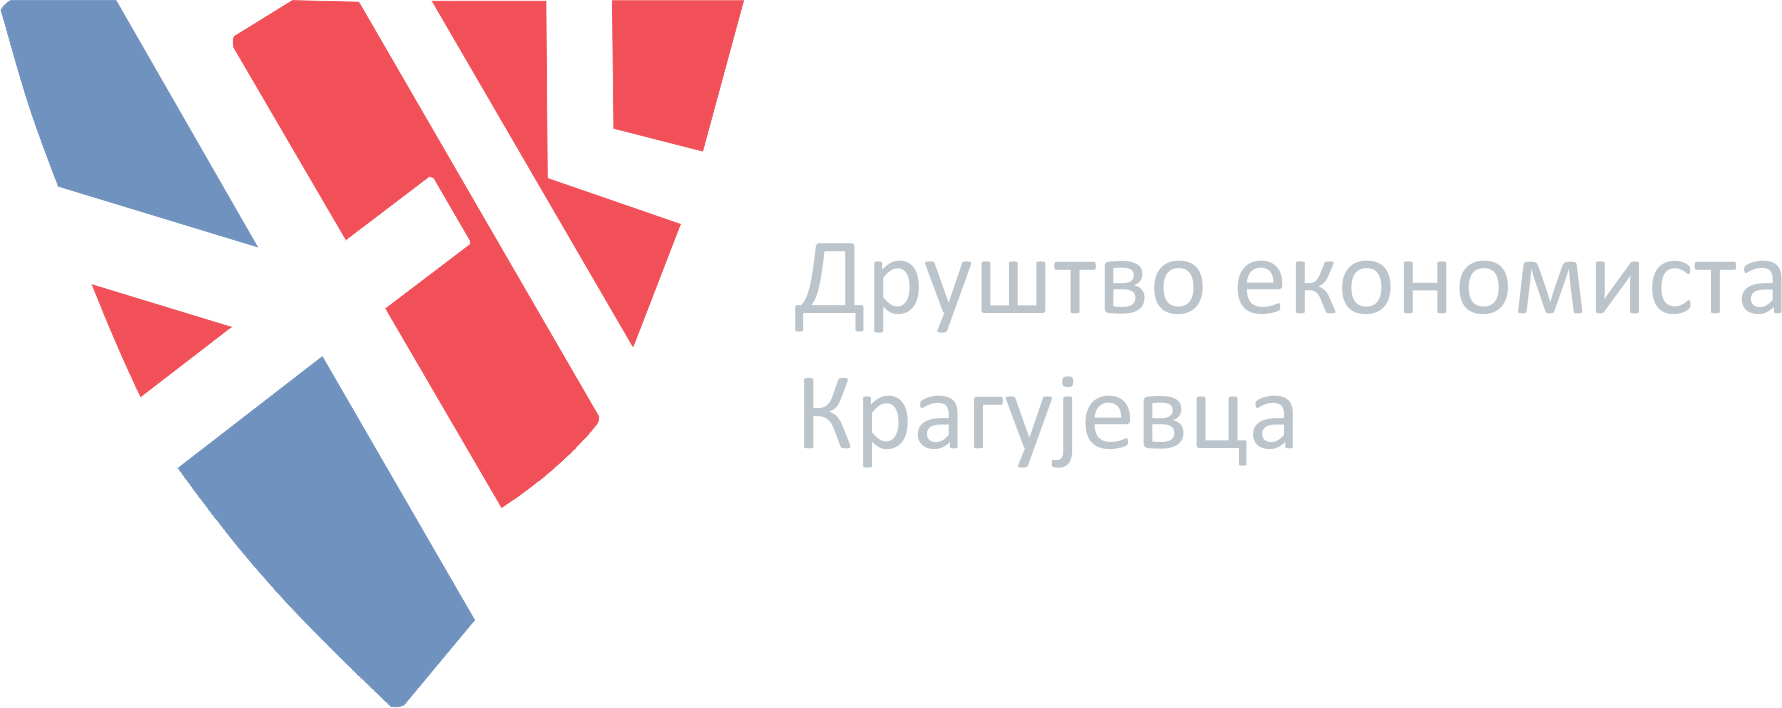 Društvo ekonomista Kragujevac